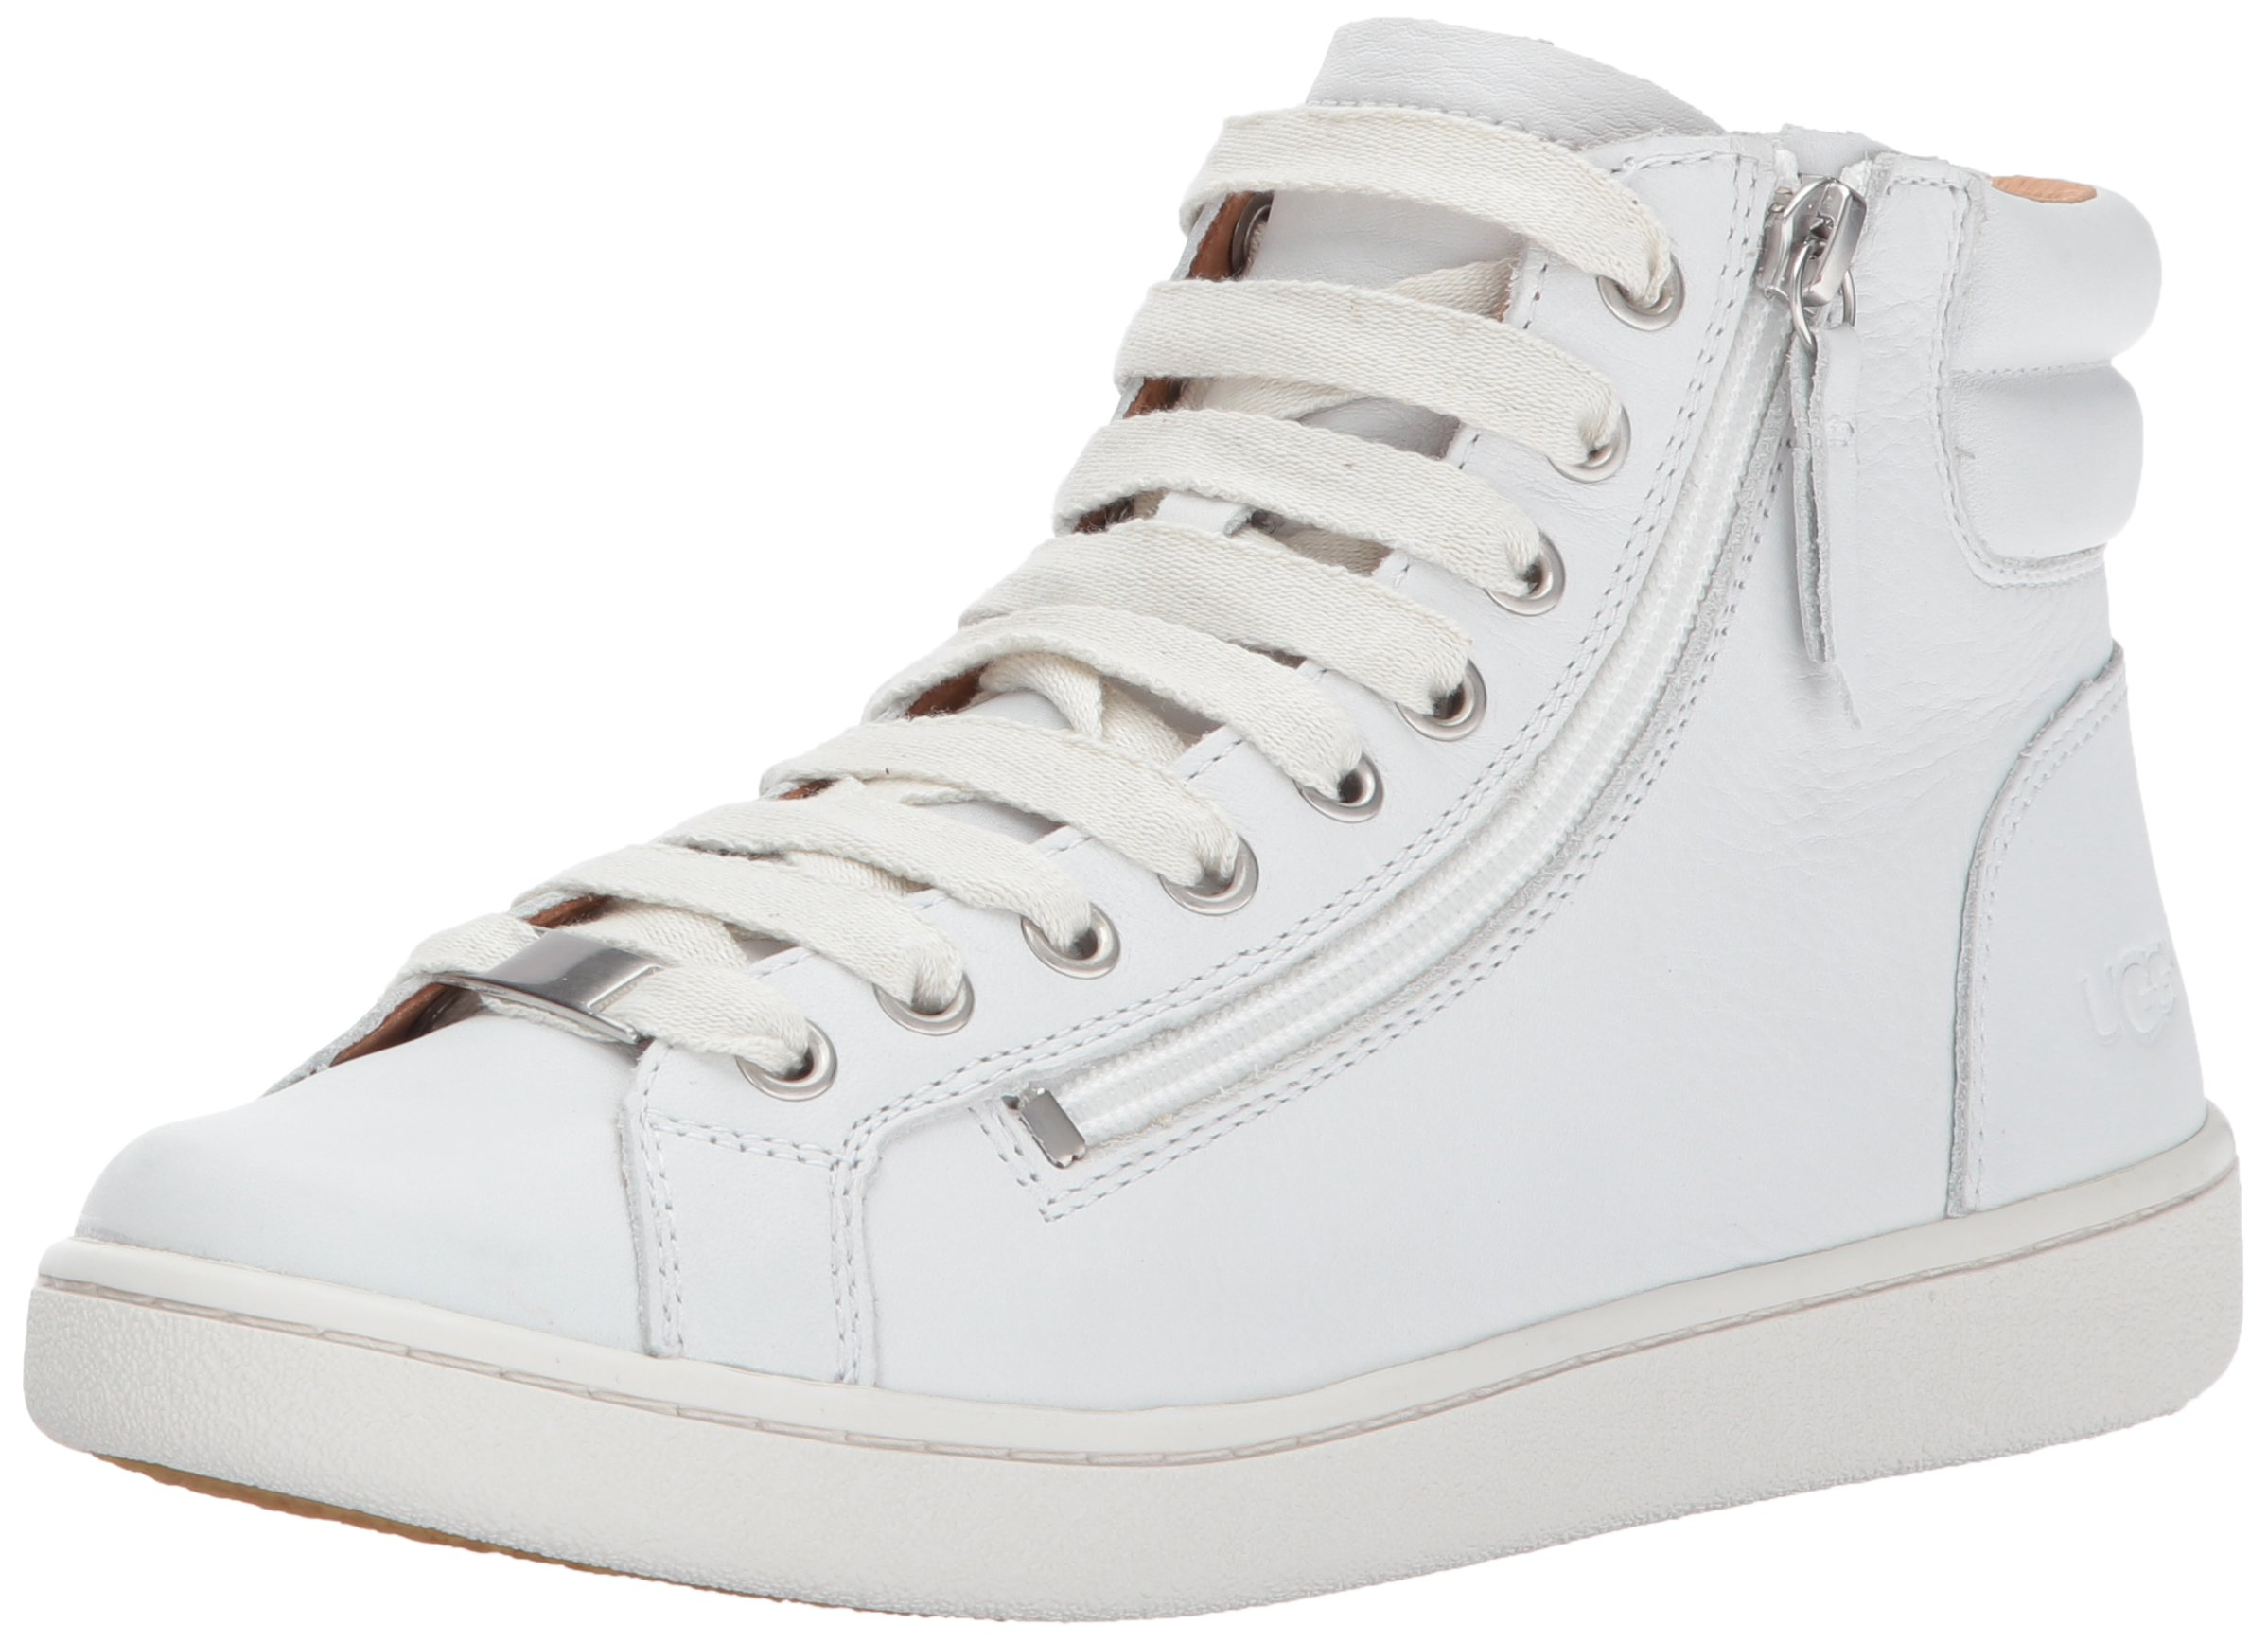 UGG Women's Olive Combat Boot, White, 8.5 M US